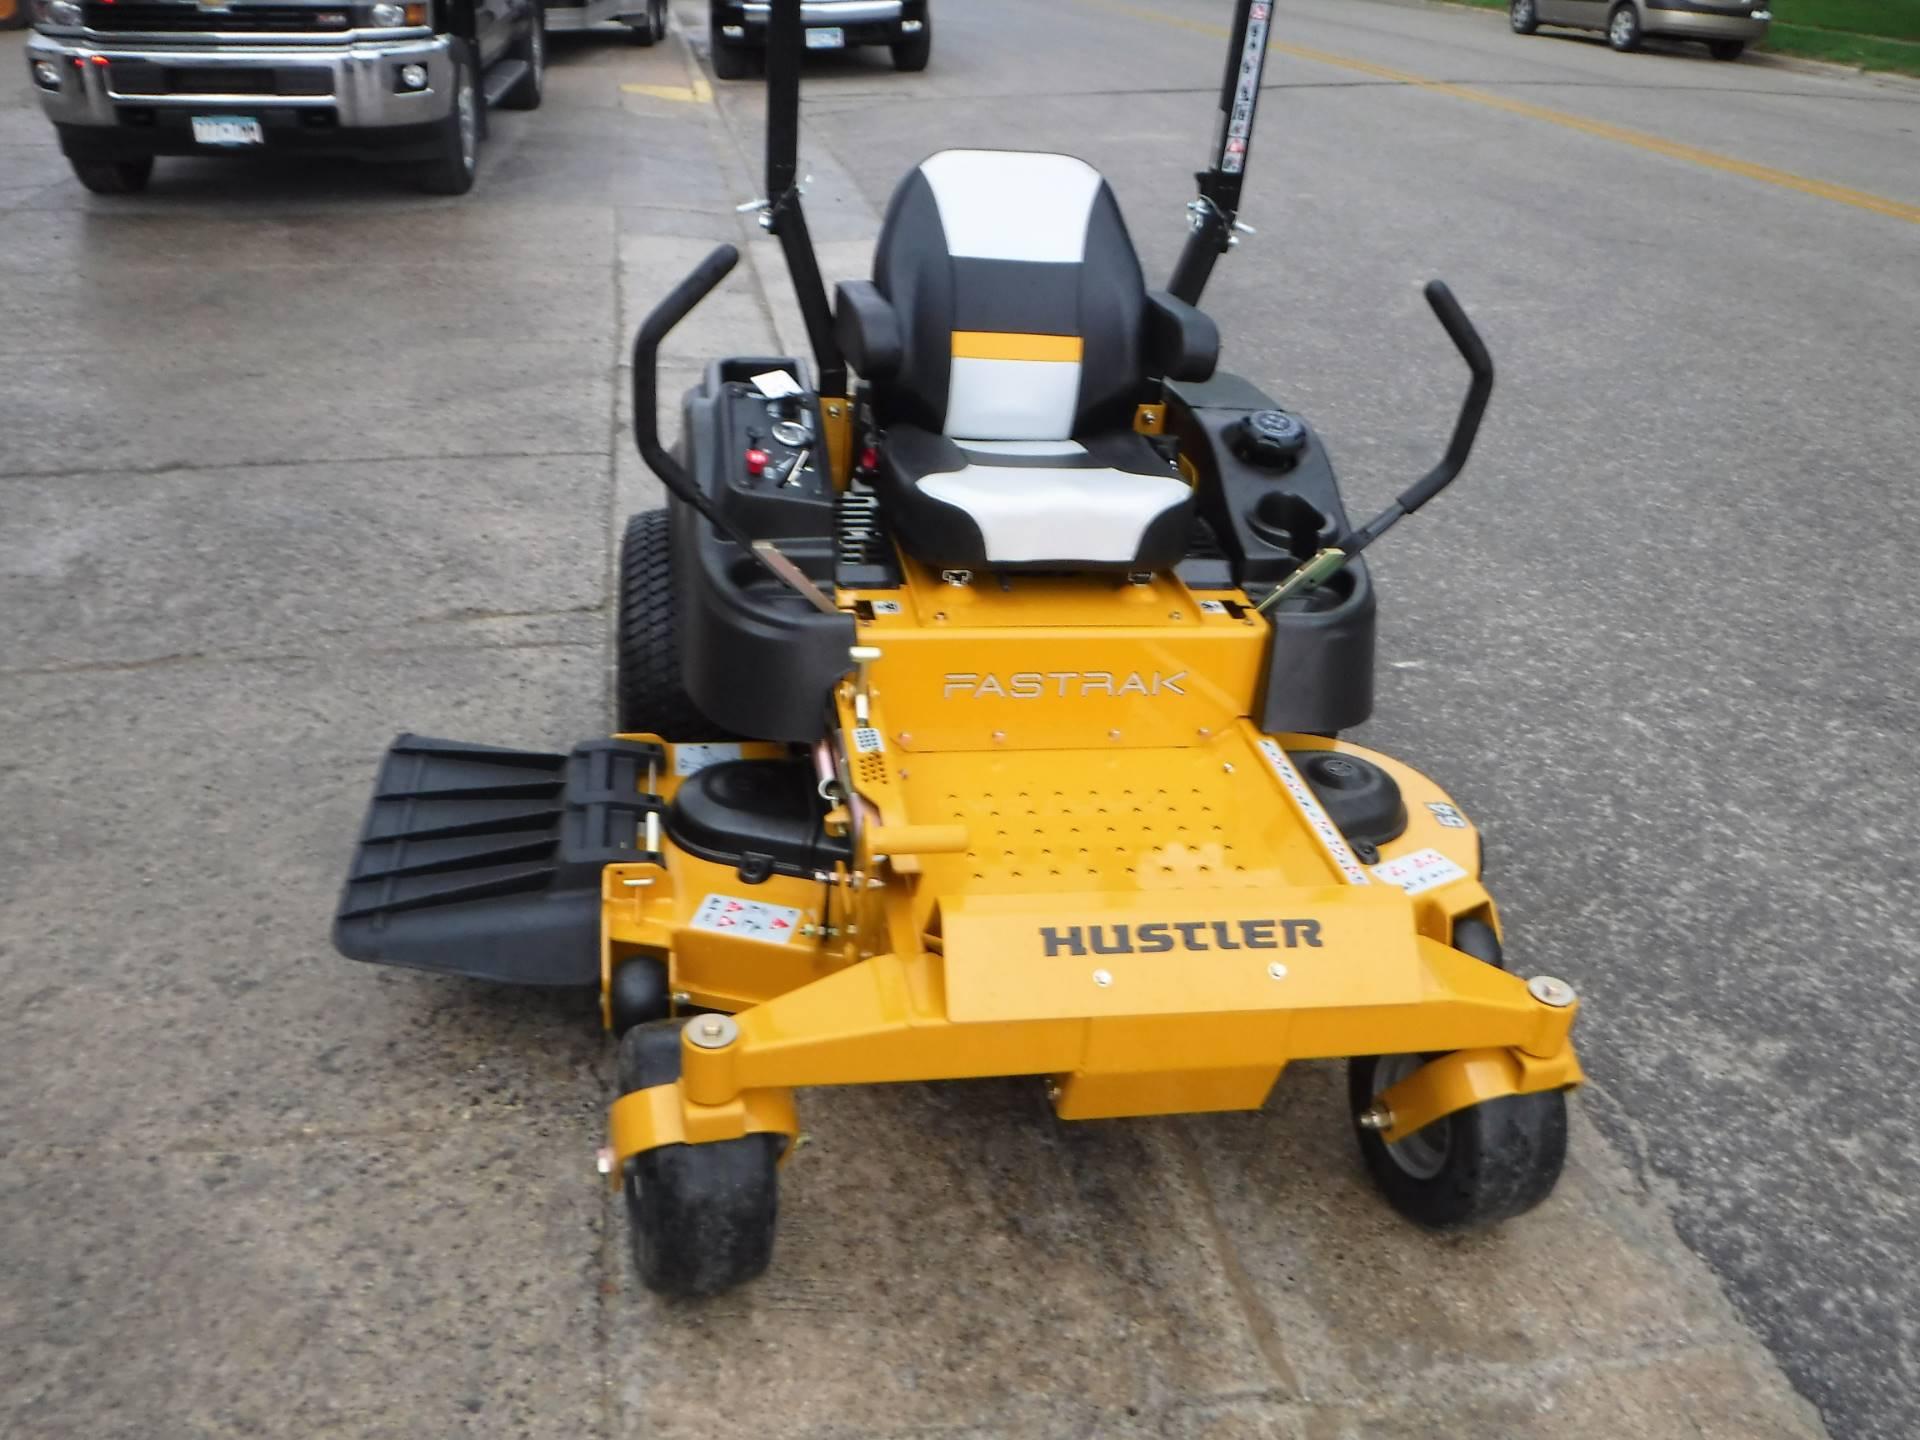 New 2017 Hustler Turf Equipment FasTrak 54 in Kawasaki FR691V Lawn